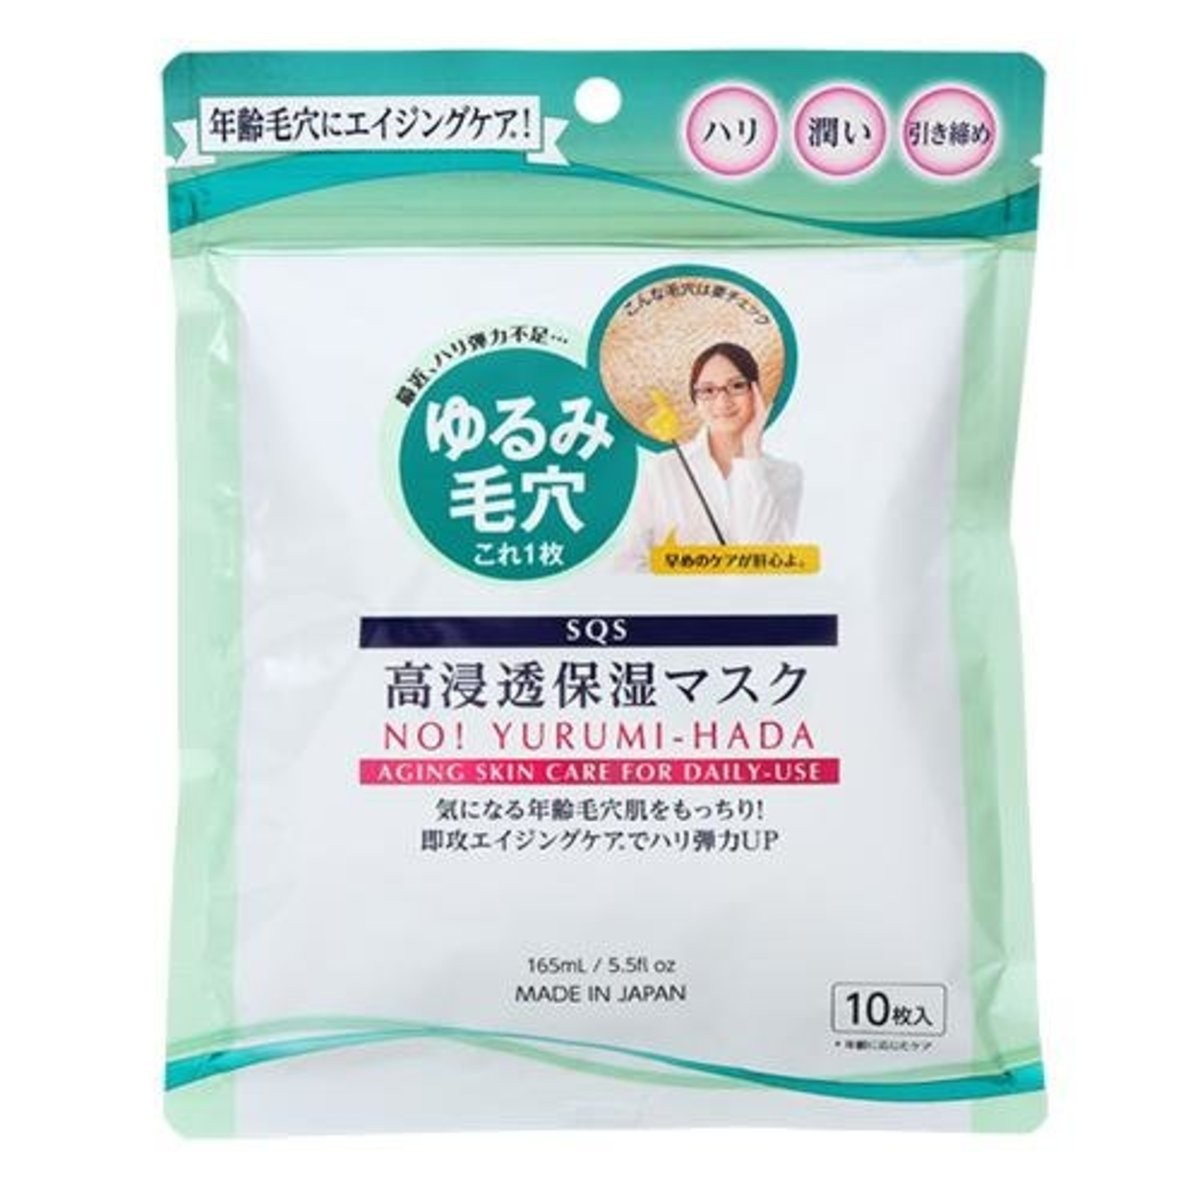 Ishizawa-Lab - SQS Moisture Pore Care Mask - 10pcs